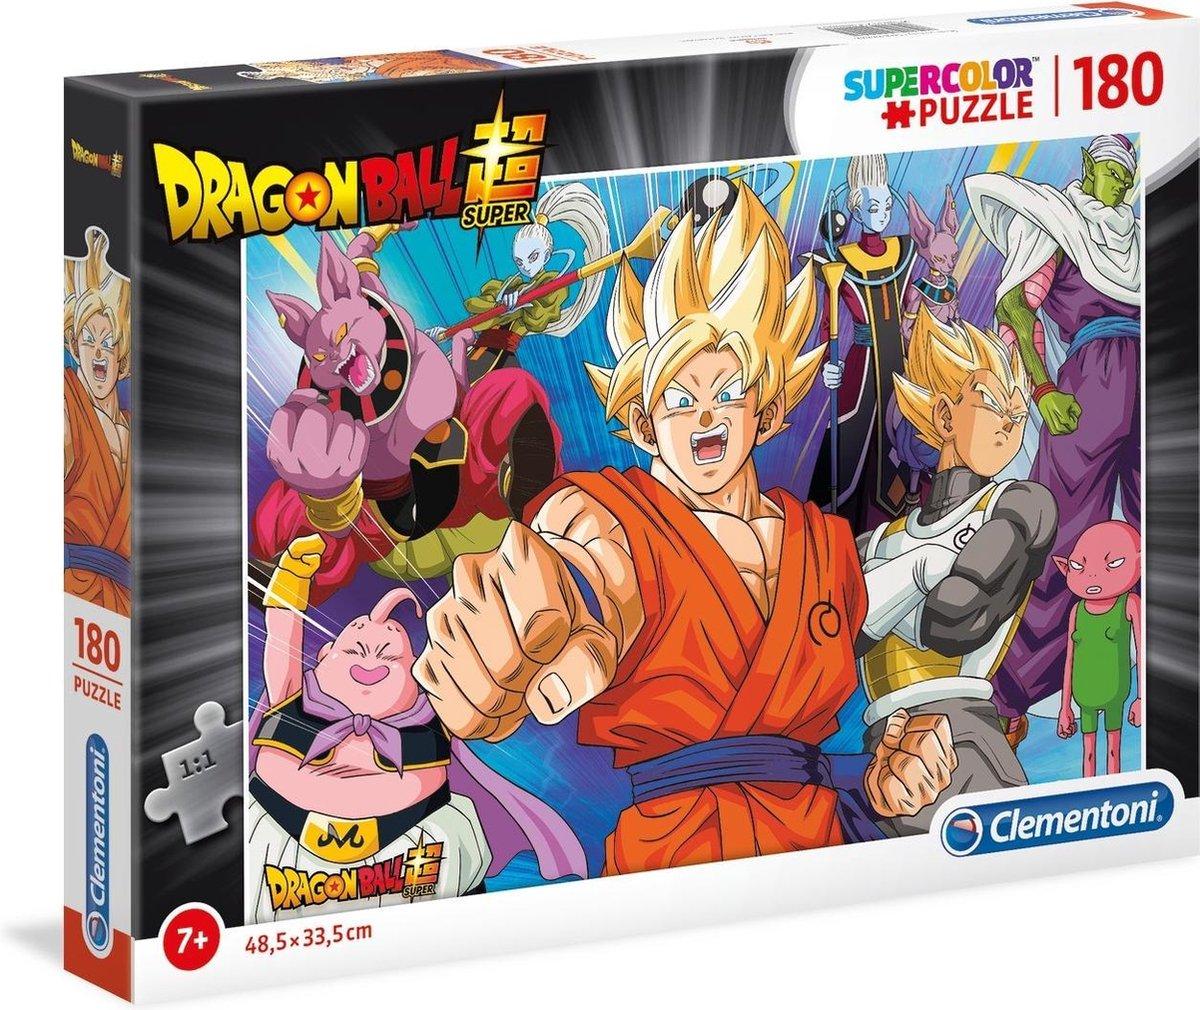 Clementoni Legpuzzel Dragon Ball Super - 180 Stukjes